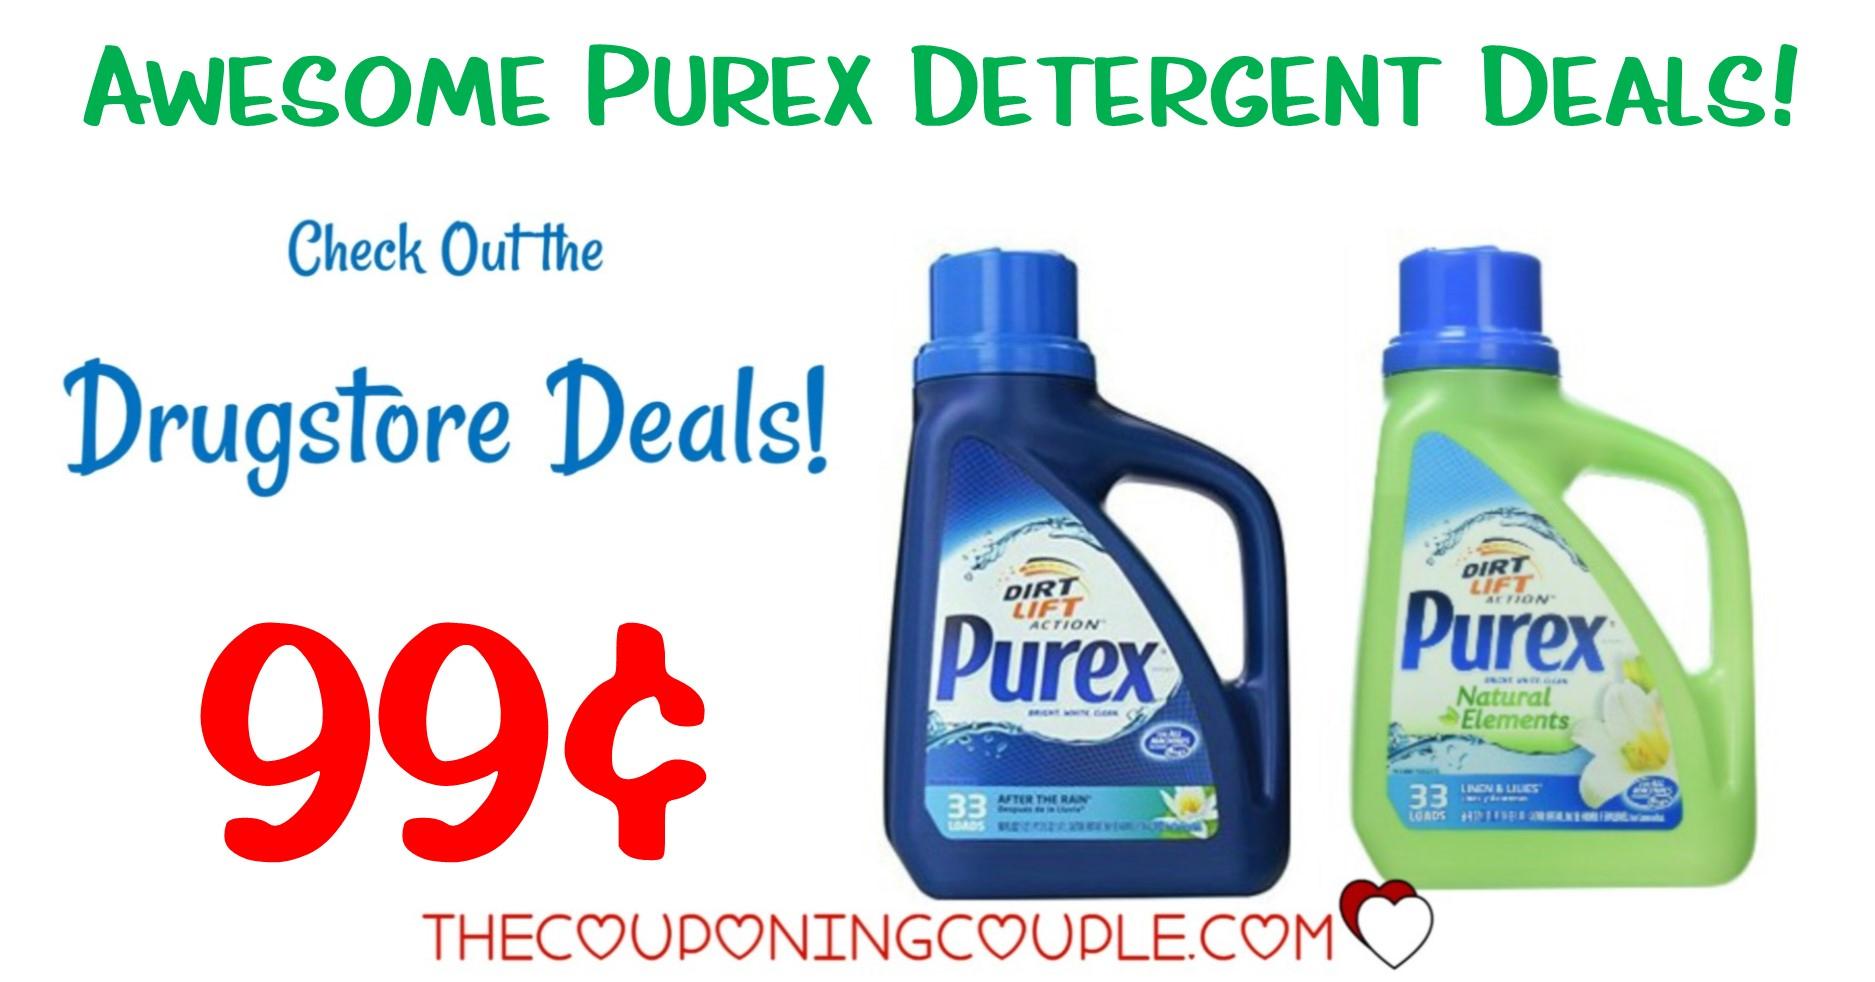 Hot** Purex Detergent Coupon + Drugstore Deals = $0.99 Each! - Free Printable Purex Detergent Coupons